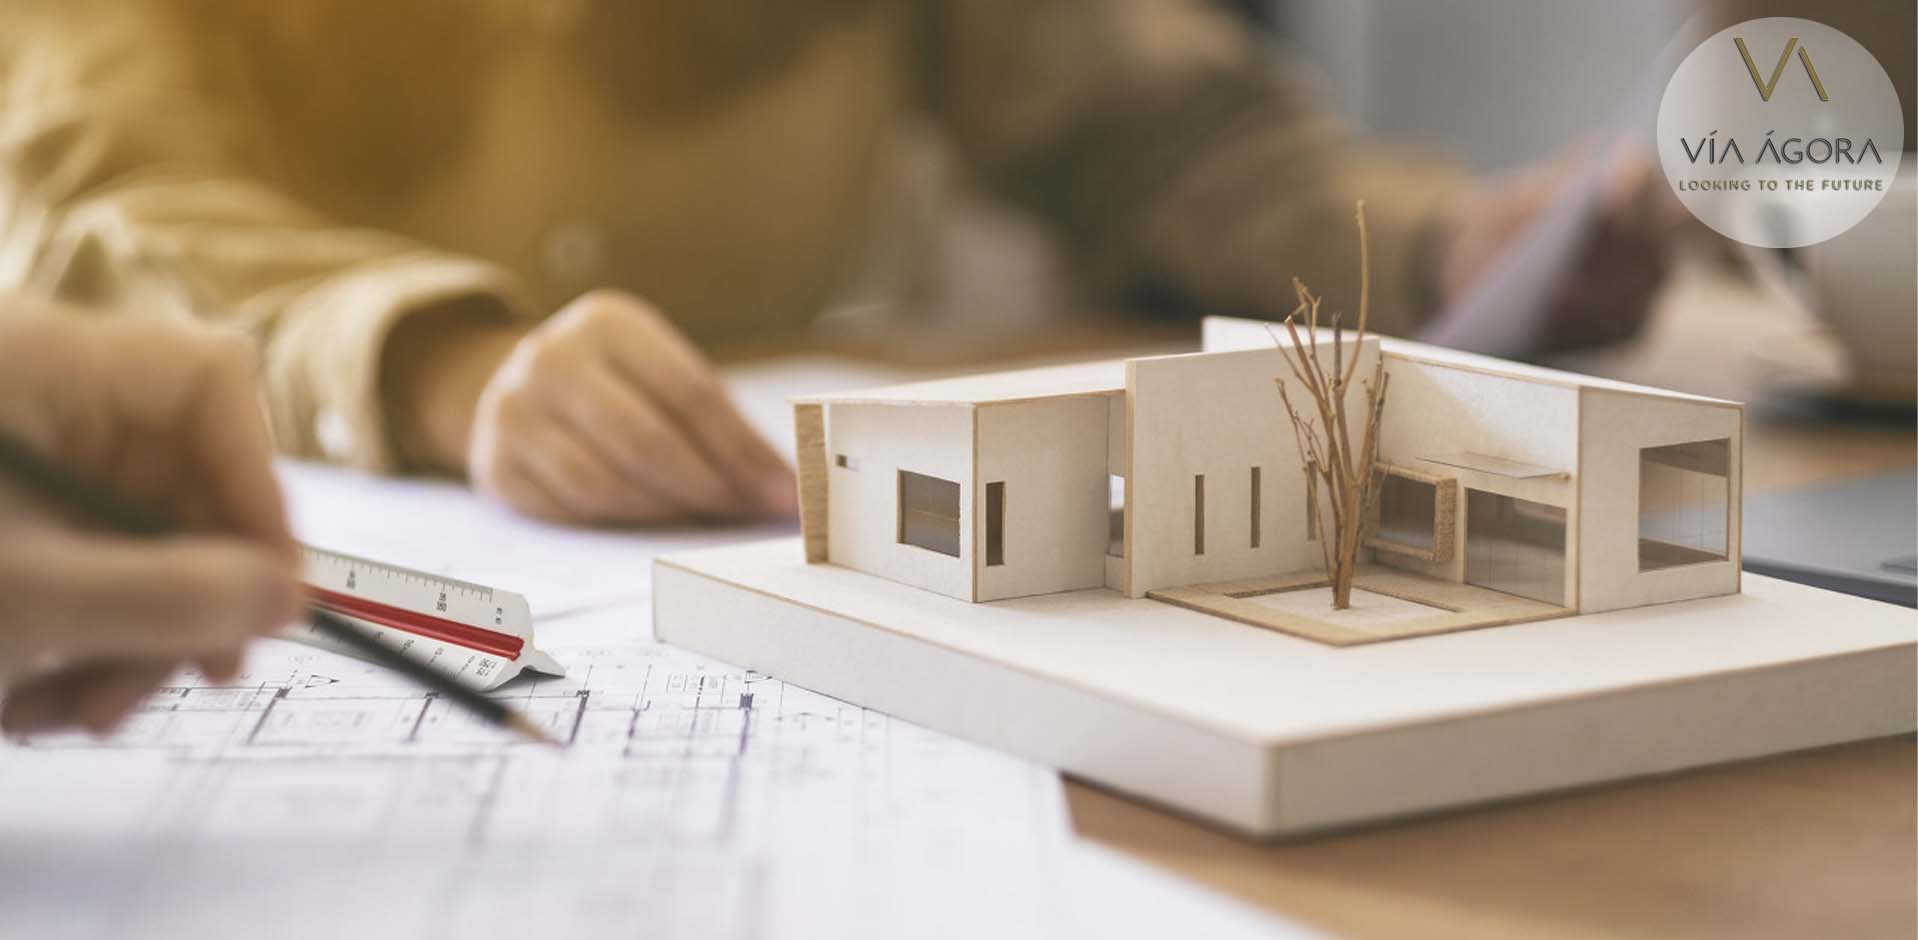 via agora - promotora inmobiliaria - industrializacion viviendas - 2